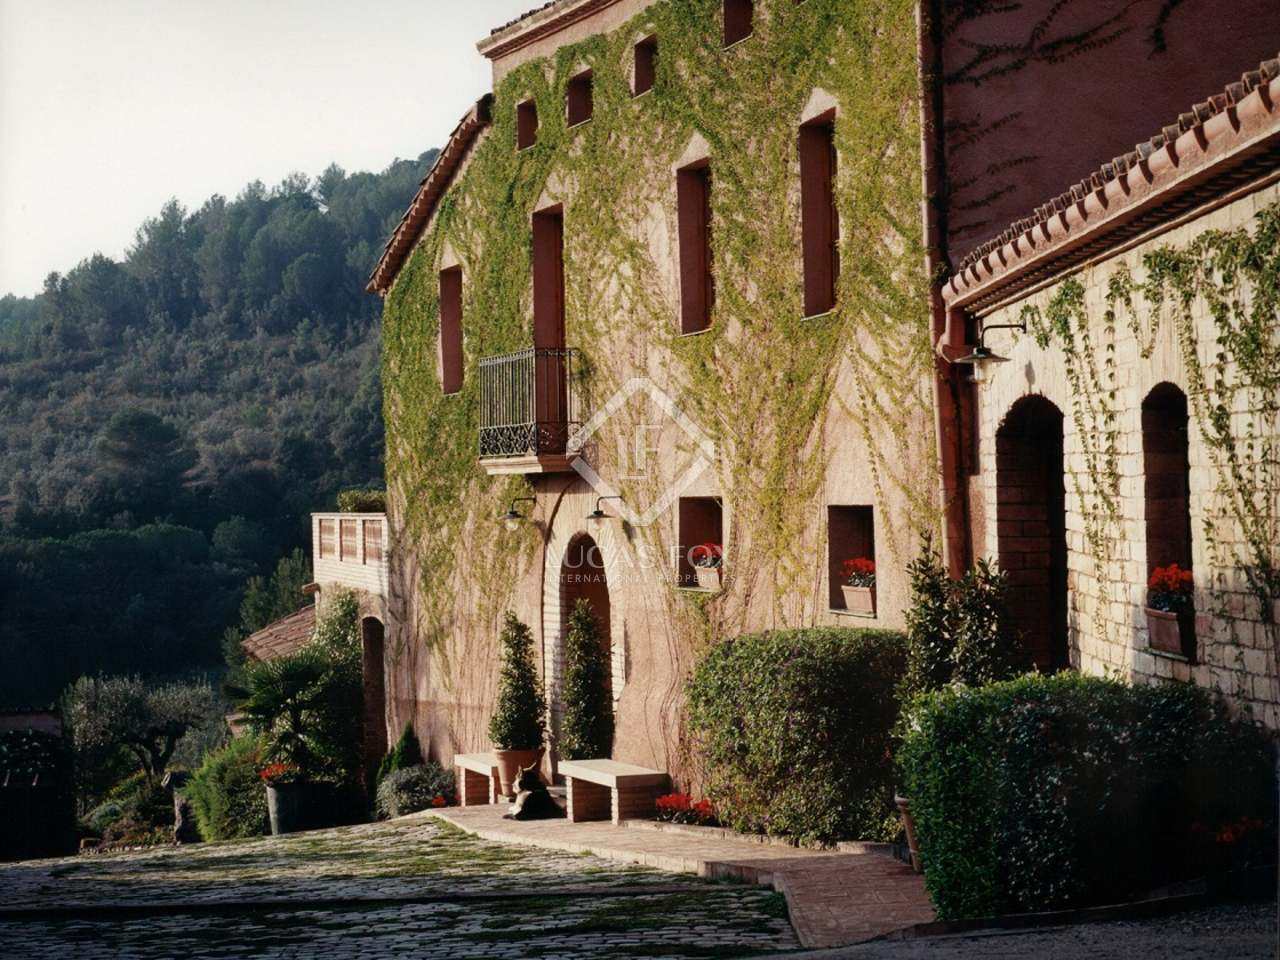 Casa rural en venta en montserrat a 40 km de barcelona - Comprar casa rural ...